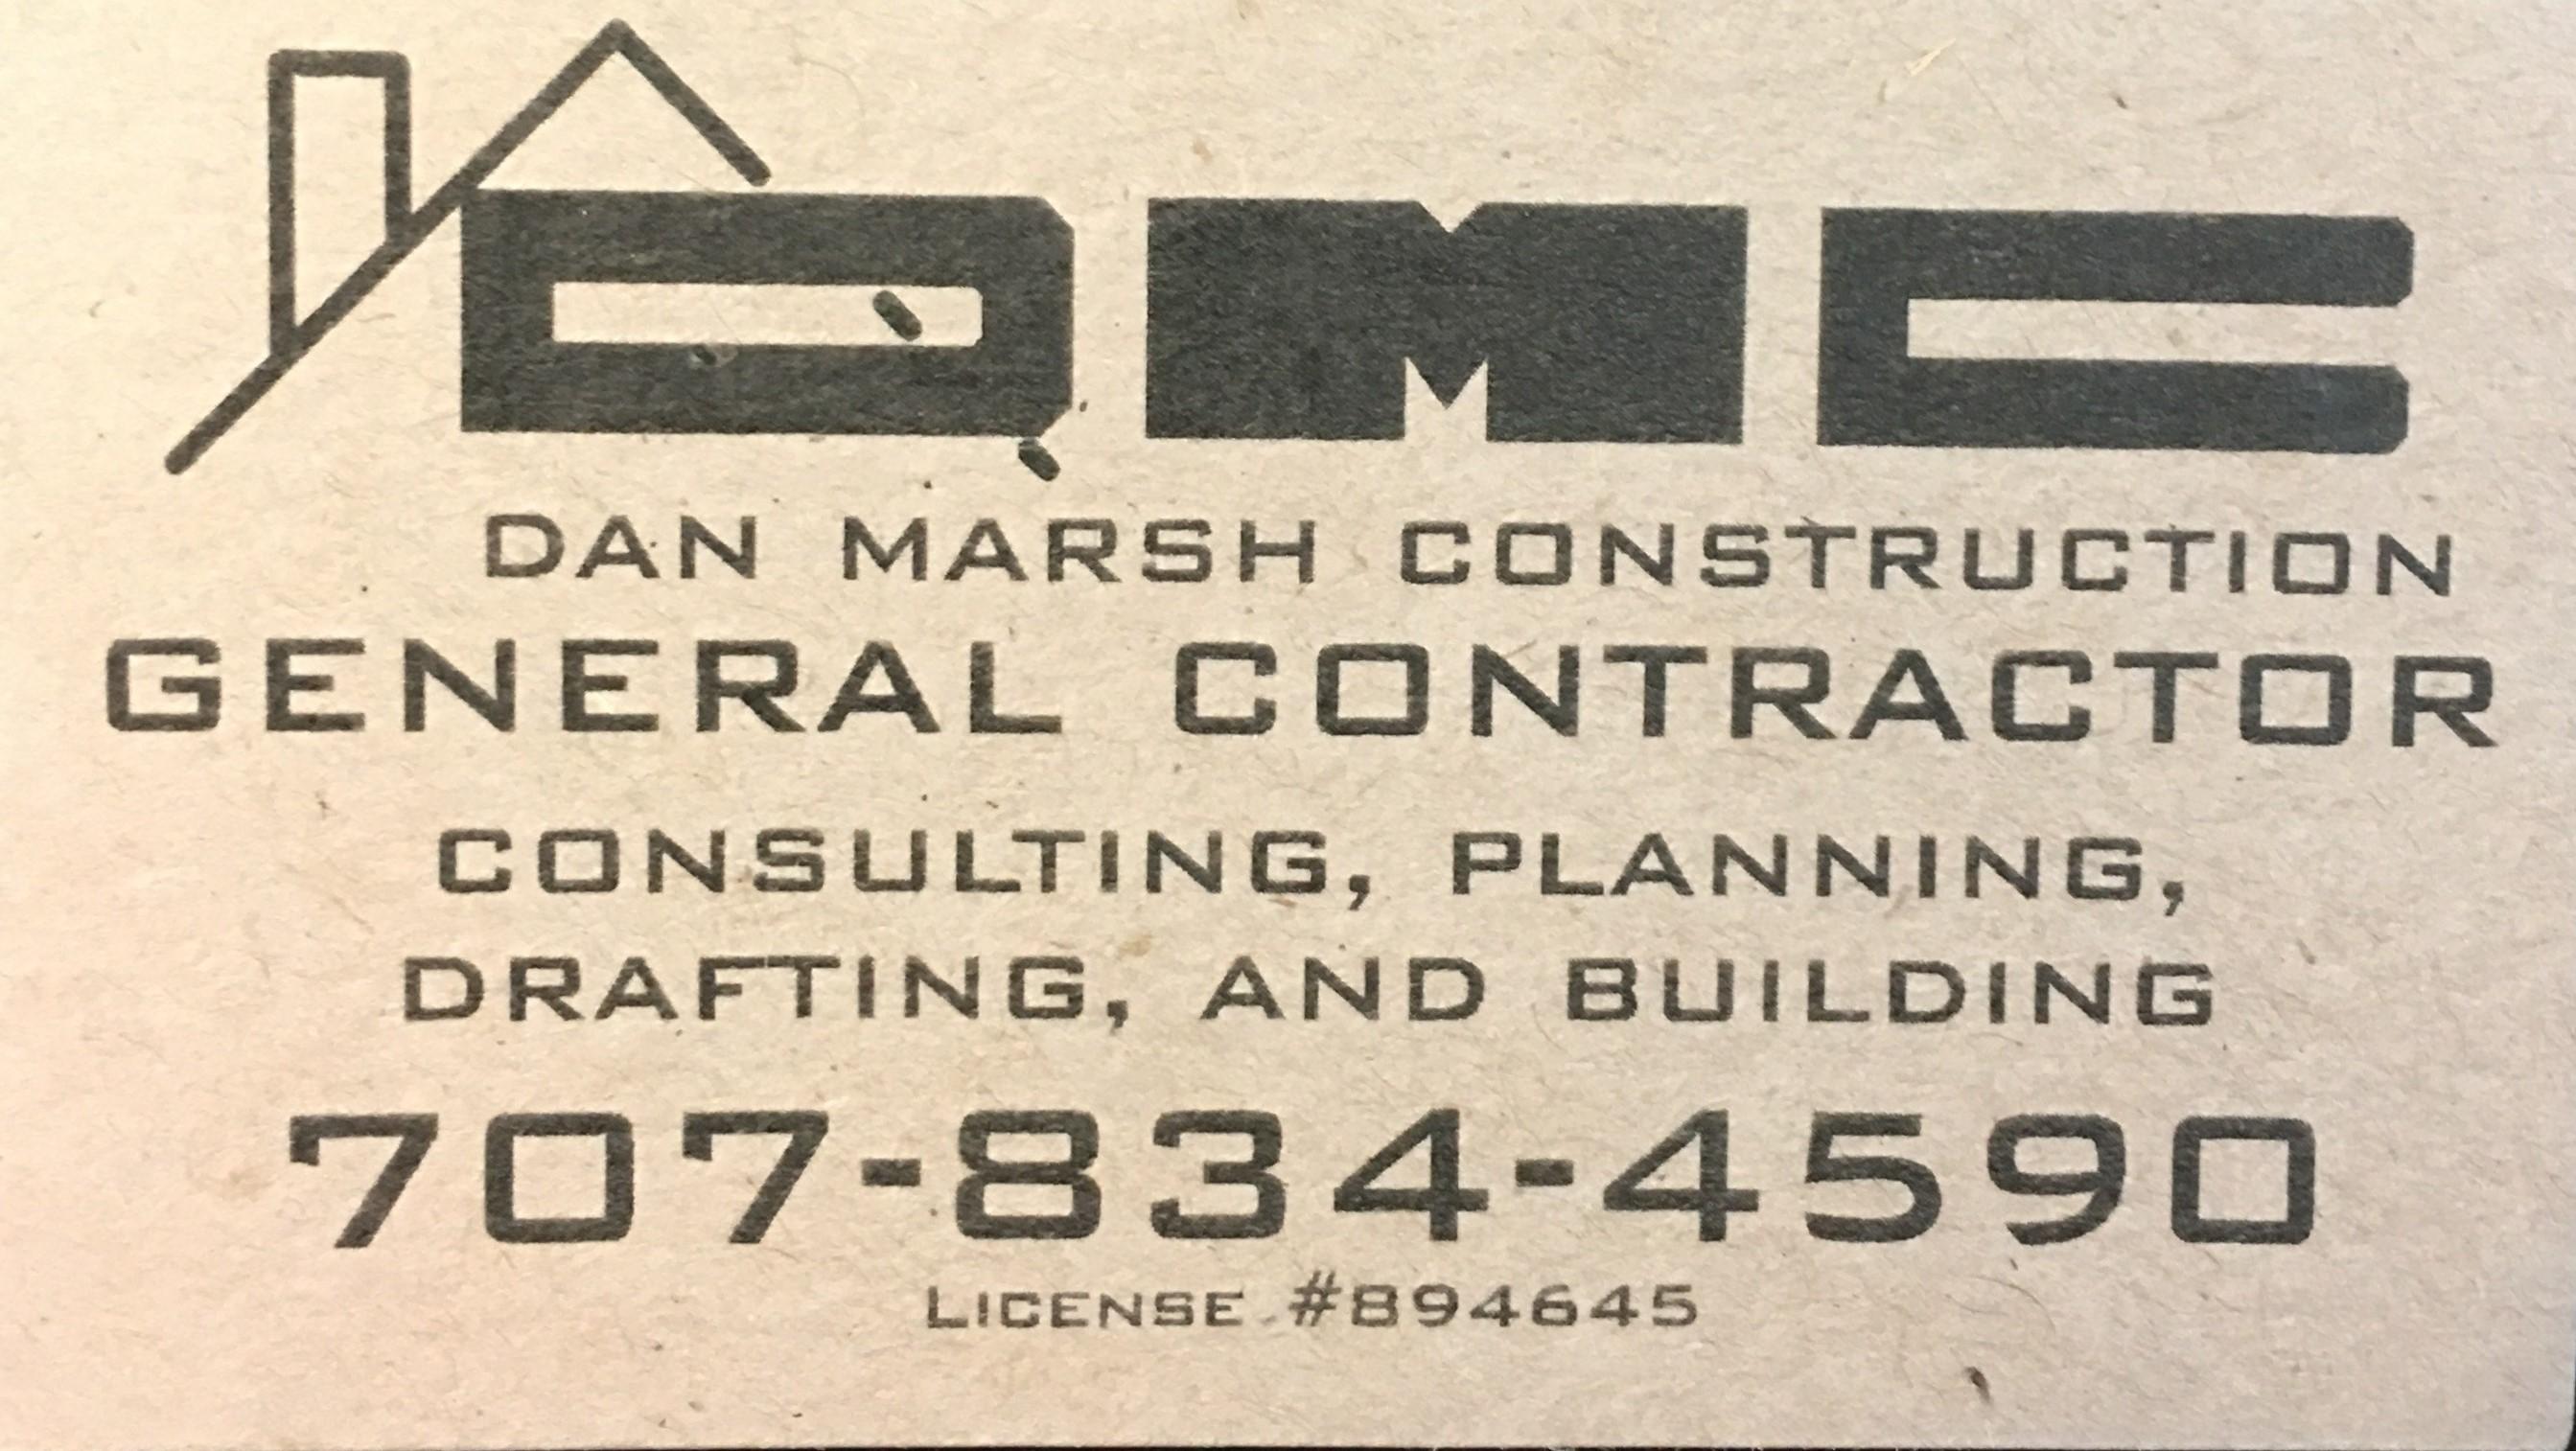 dmc construction home